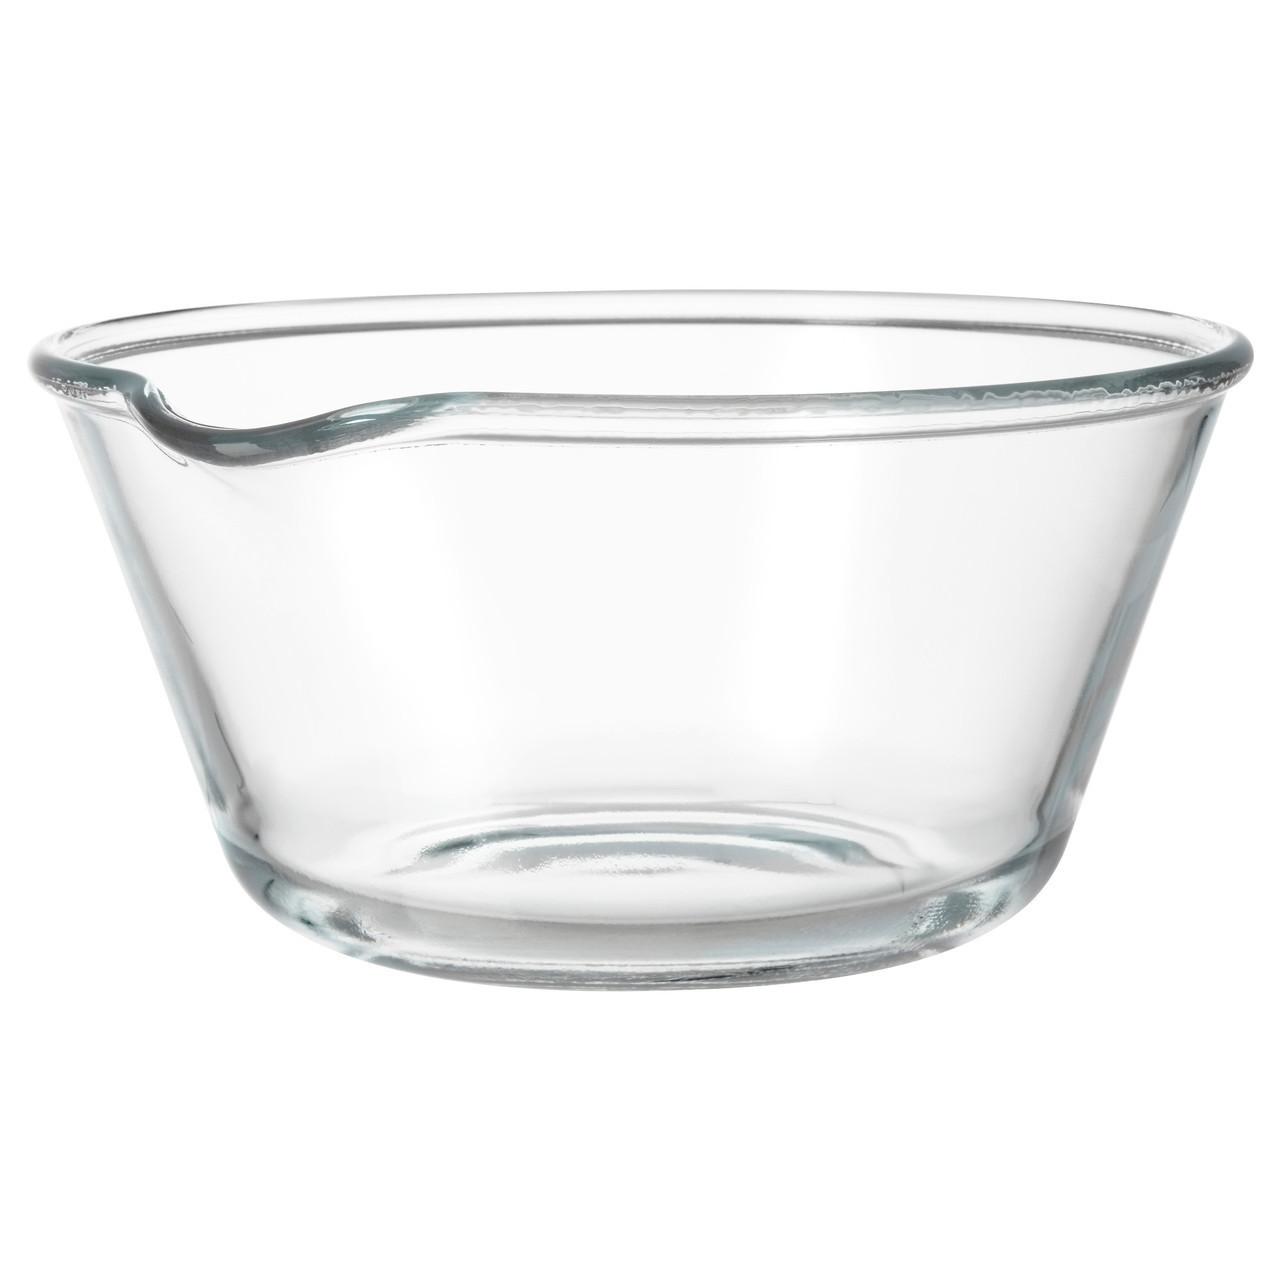 VARDAGEN Миска, прозрачное стекло 702.892.48